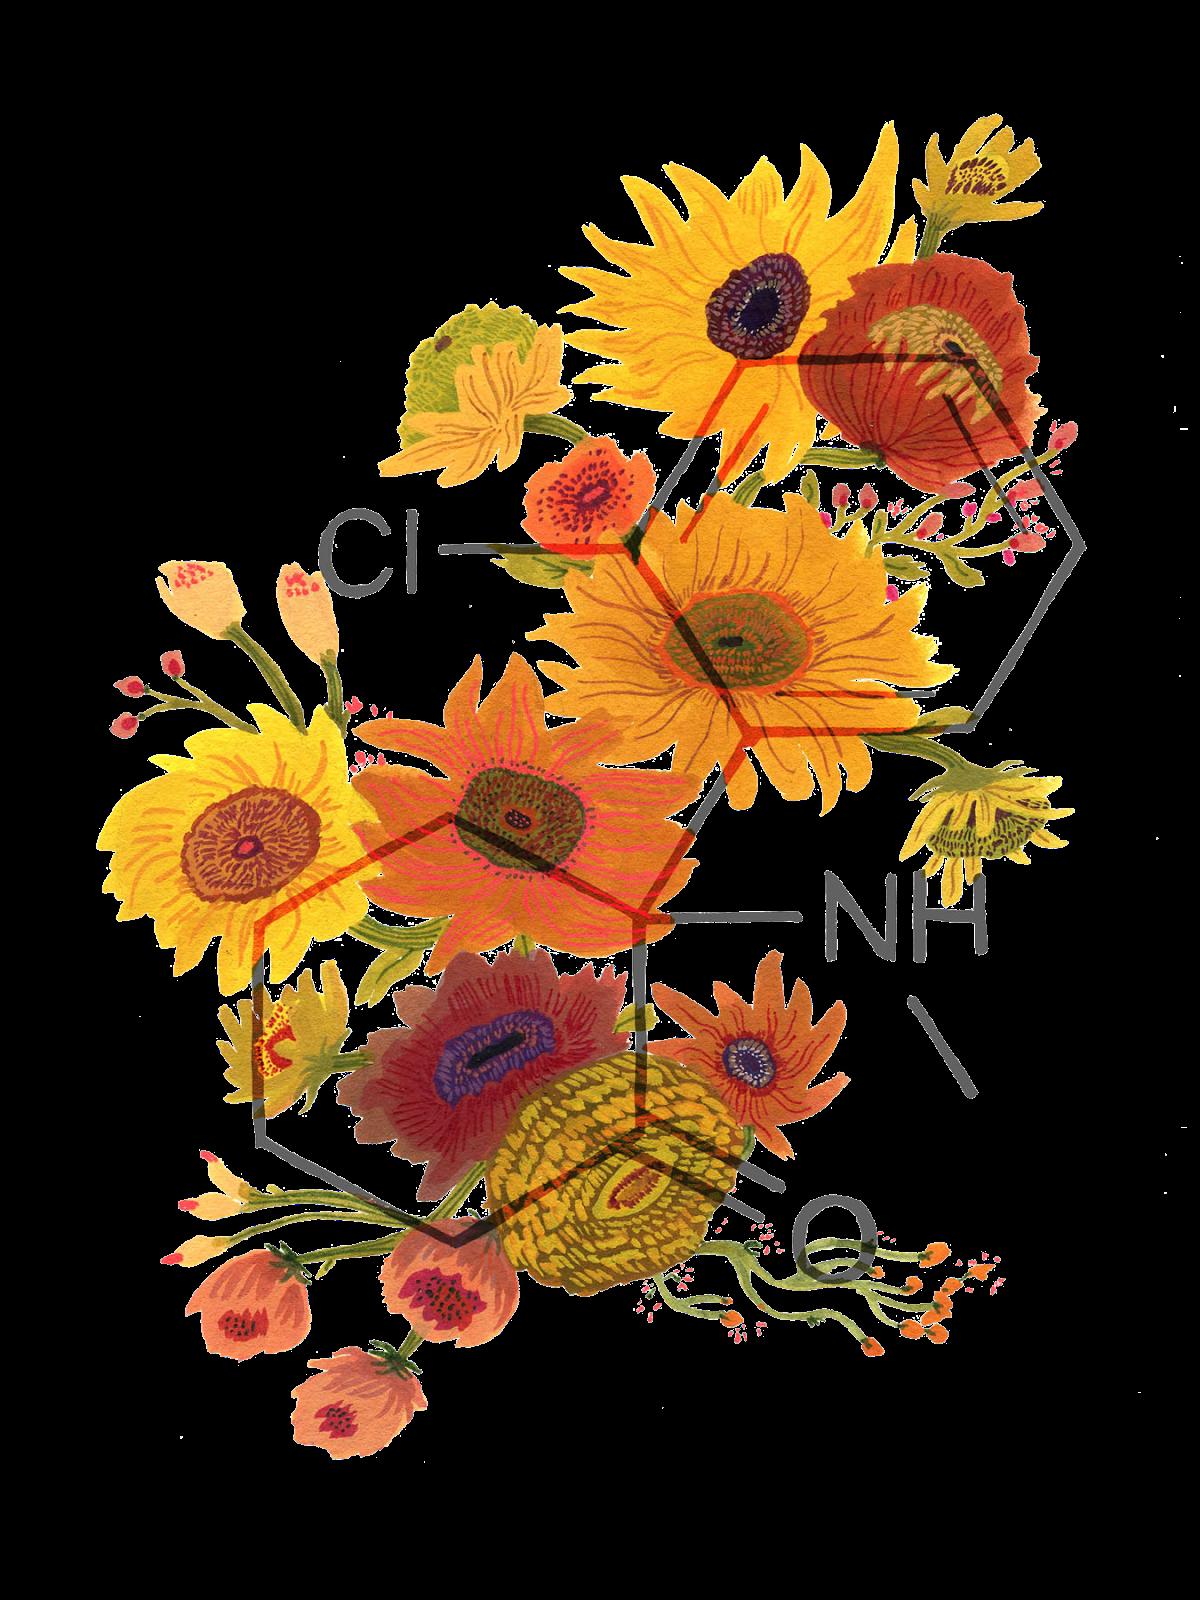 sunflowers | illustration - plant still life flowers | Pinterest ...